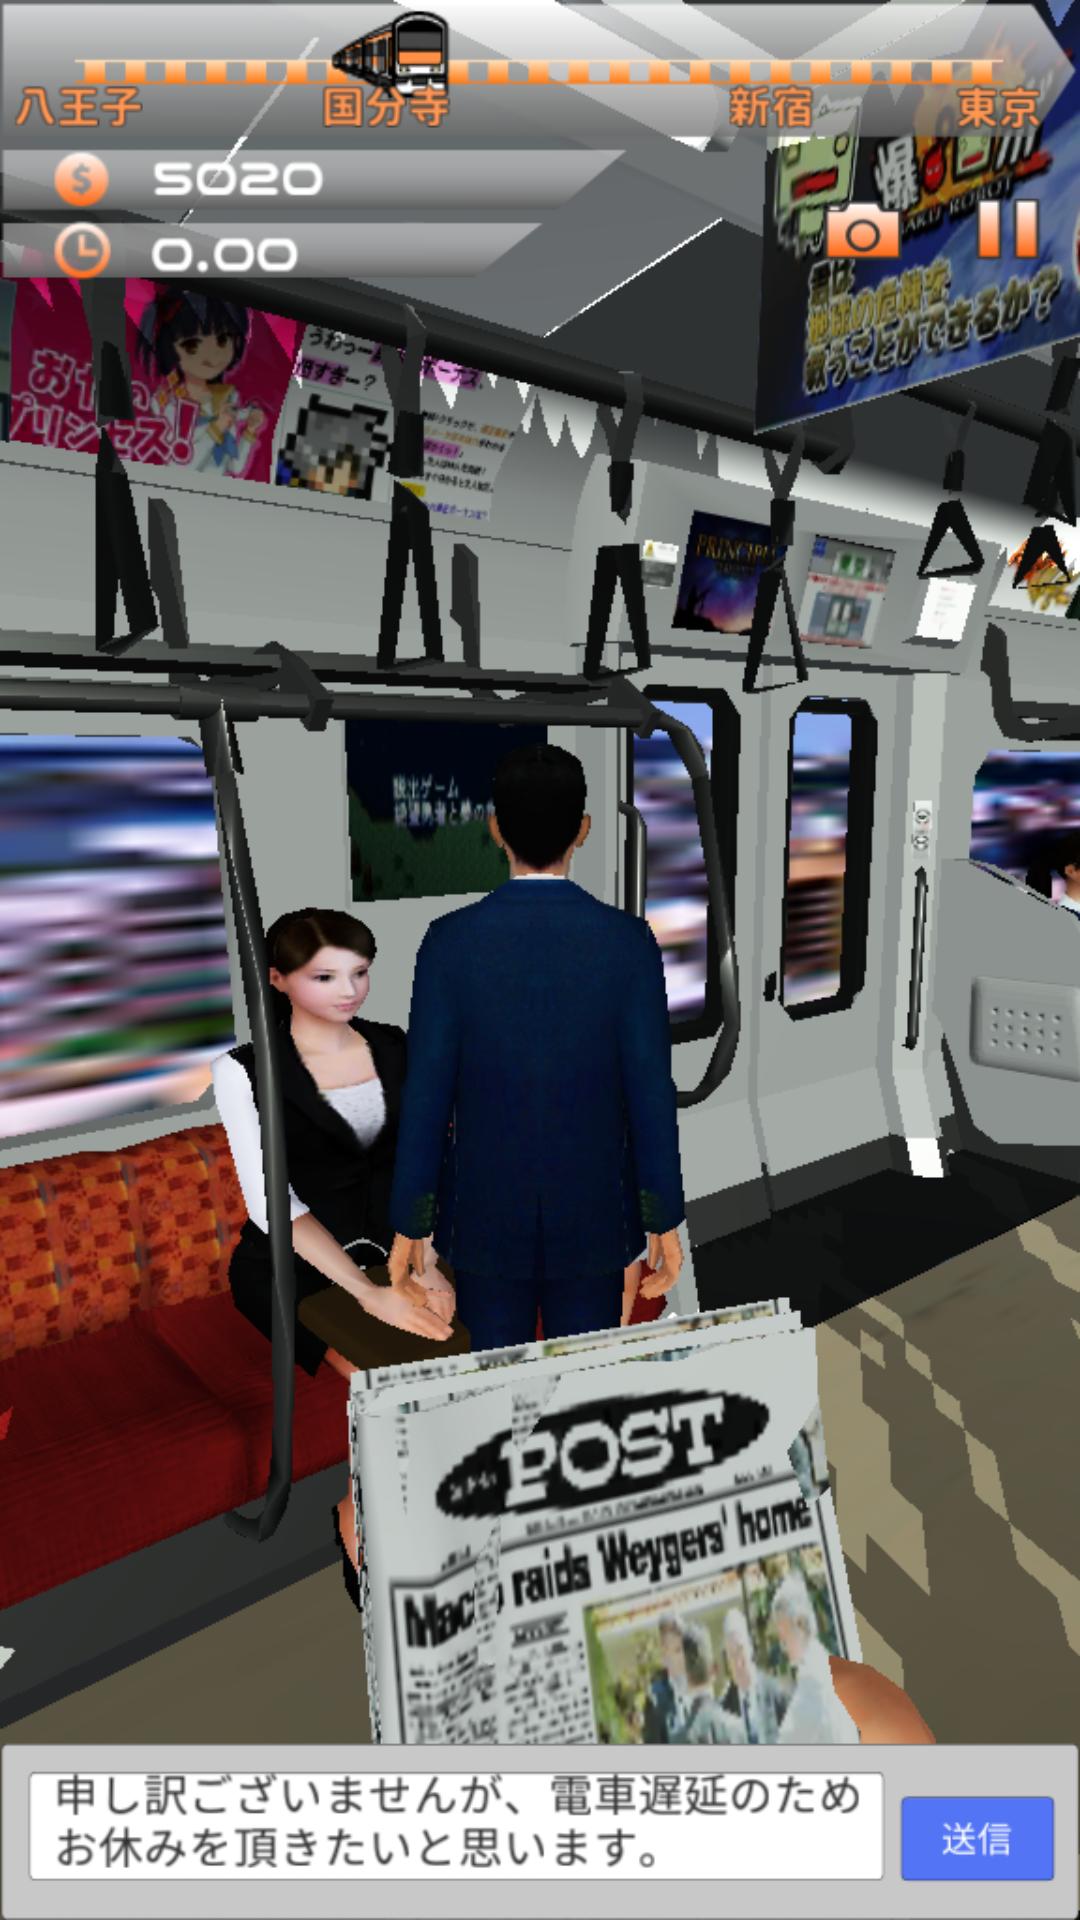 androidアプリ 30秒で通勤する方法〜八王子から東京駅まで〜攻略スクリーンショット5